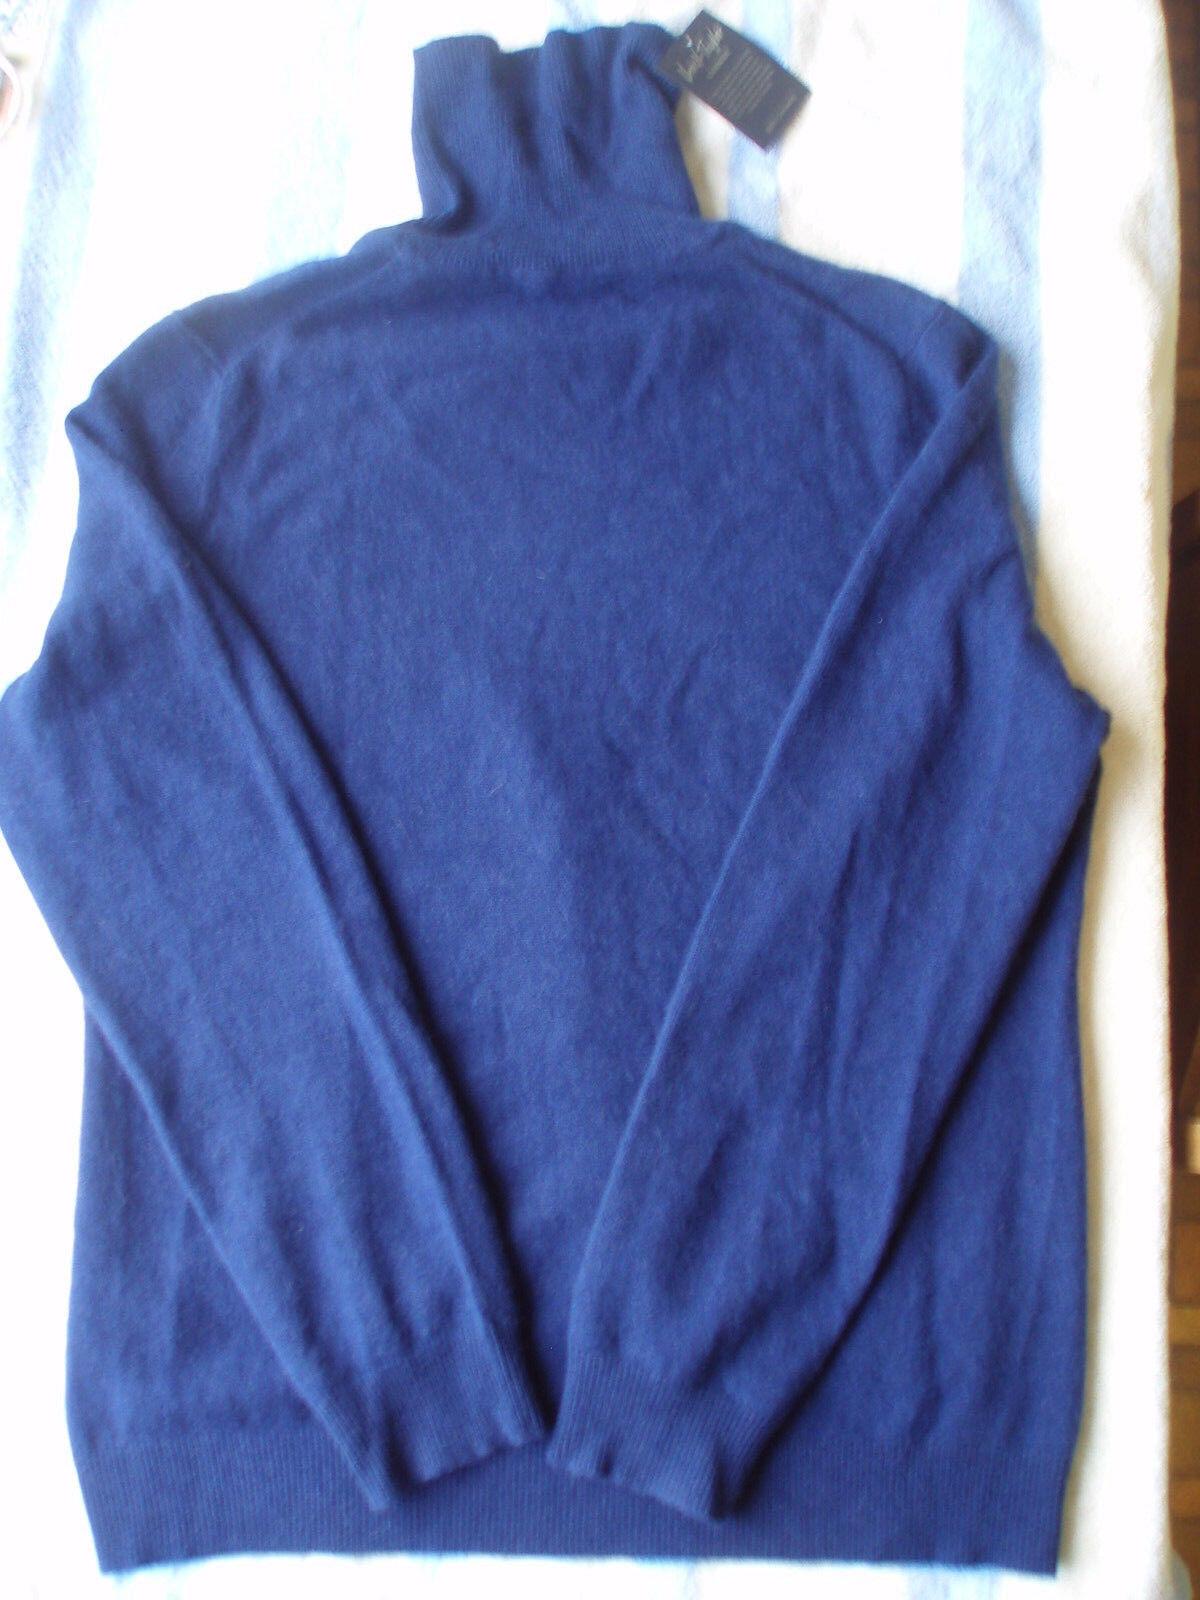 NWT Cashmere bleu turtleneck chandail Taille XL - very soft